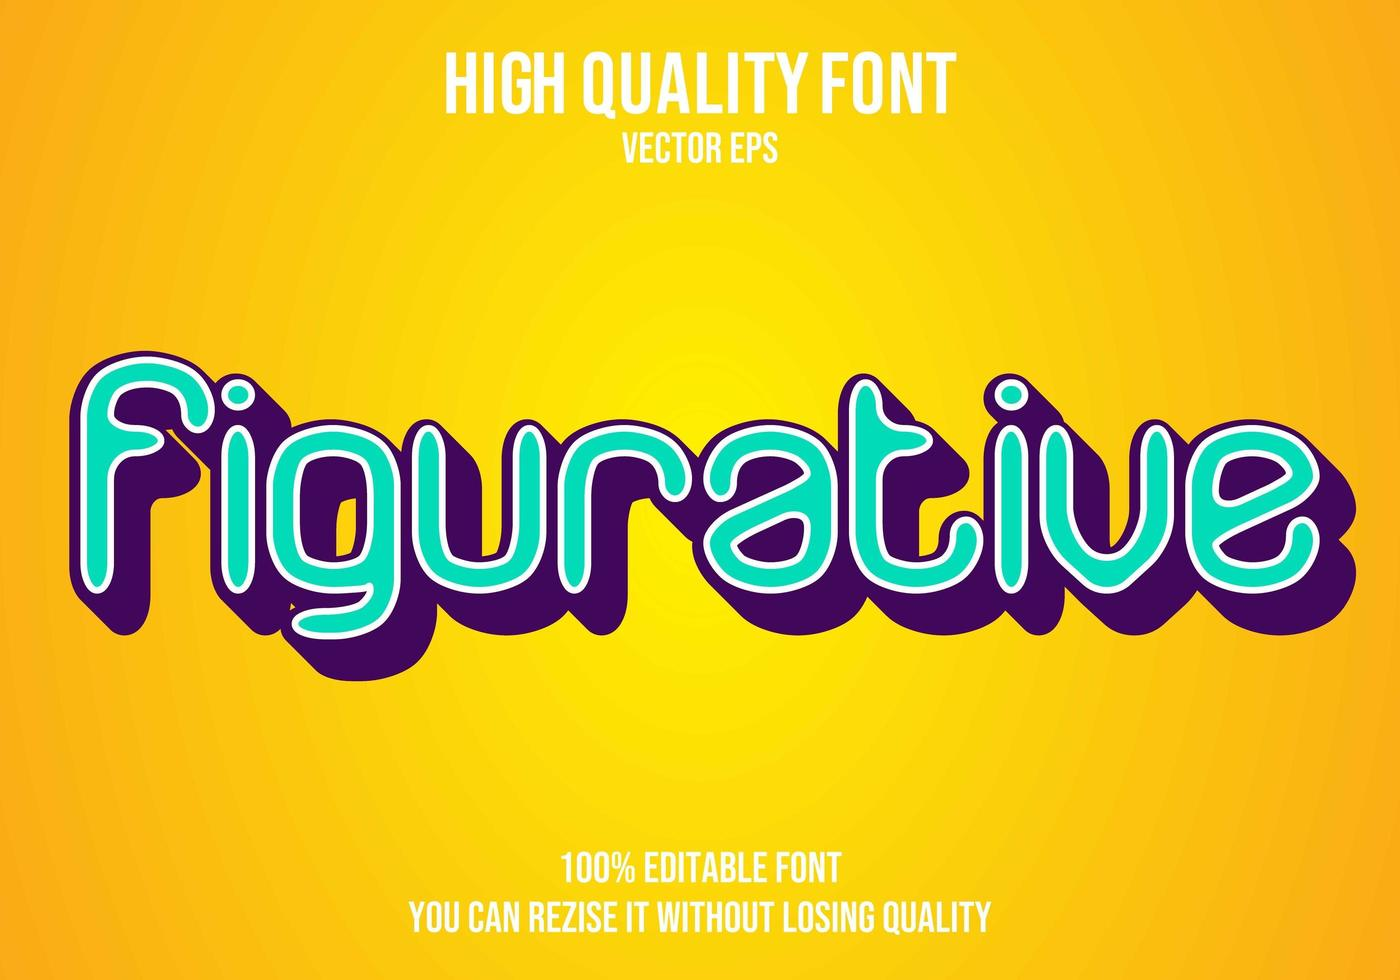 figurativ retro redigerbar texteffekt vektor